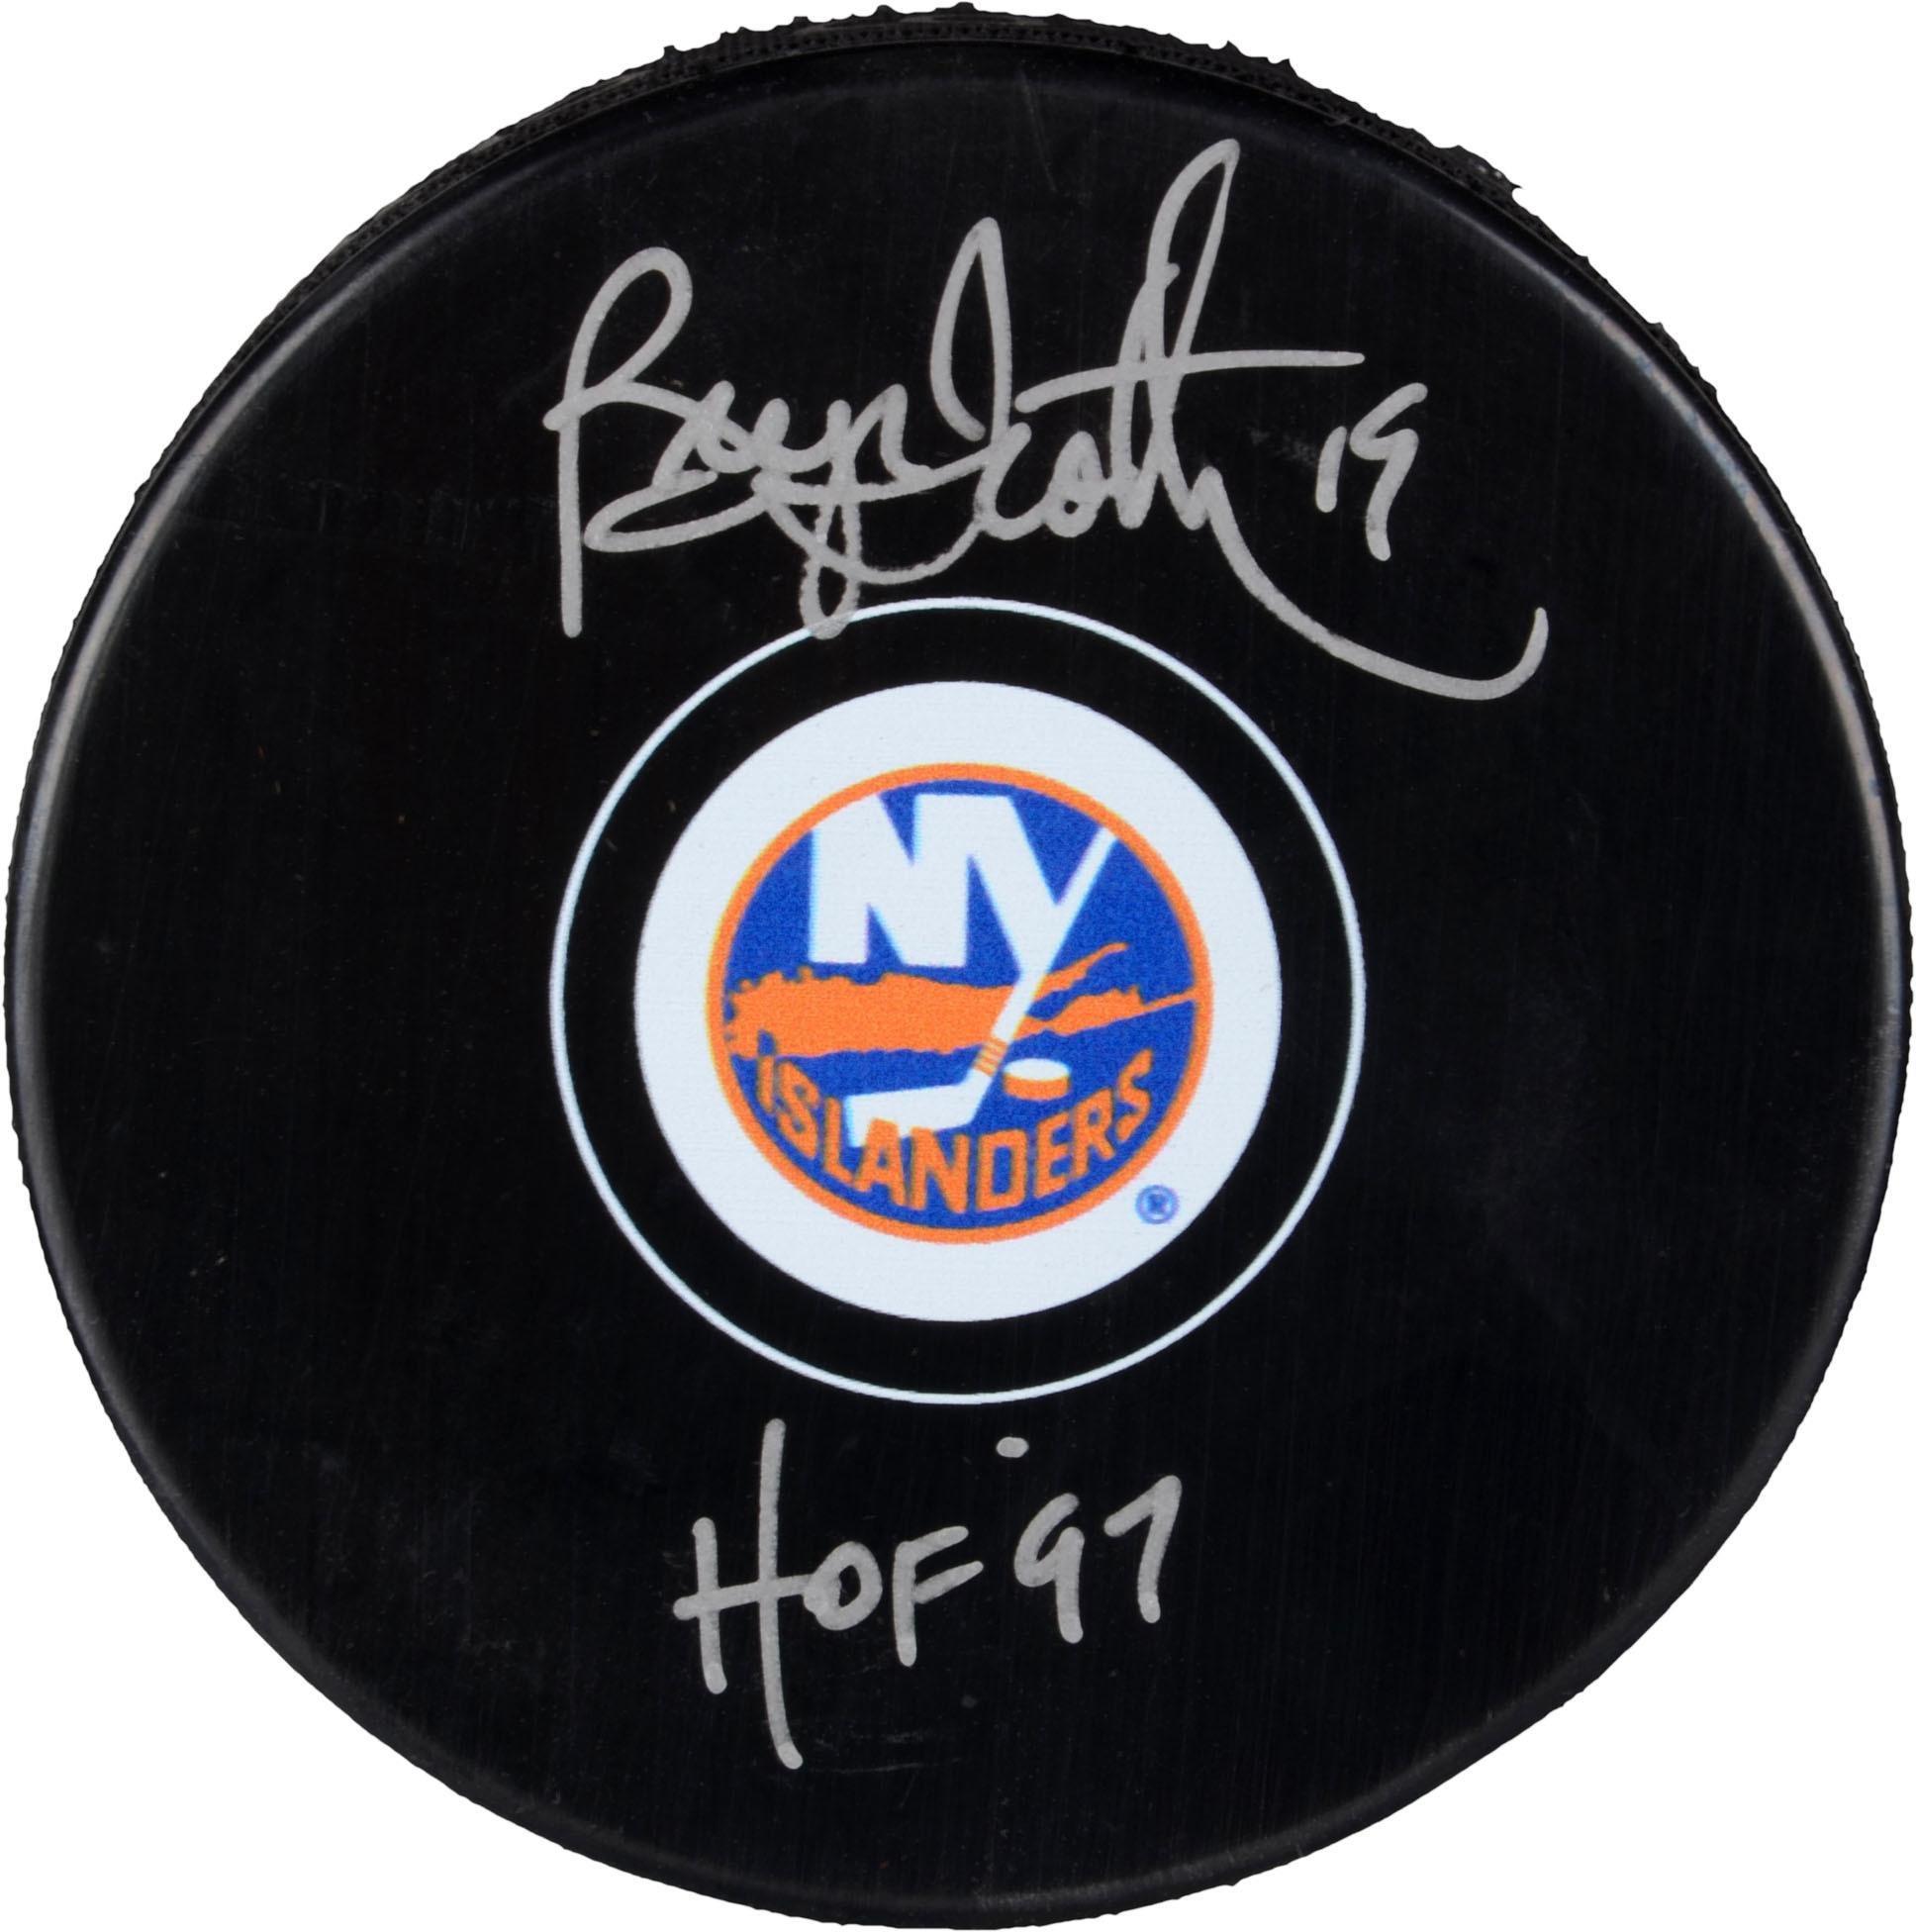 Bryan Trottier New York Islanders Autographed Hockey Puck with HOF 1997 Inscription Fanatics Authentic Certified